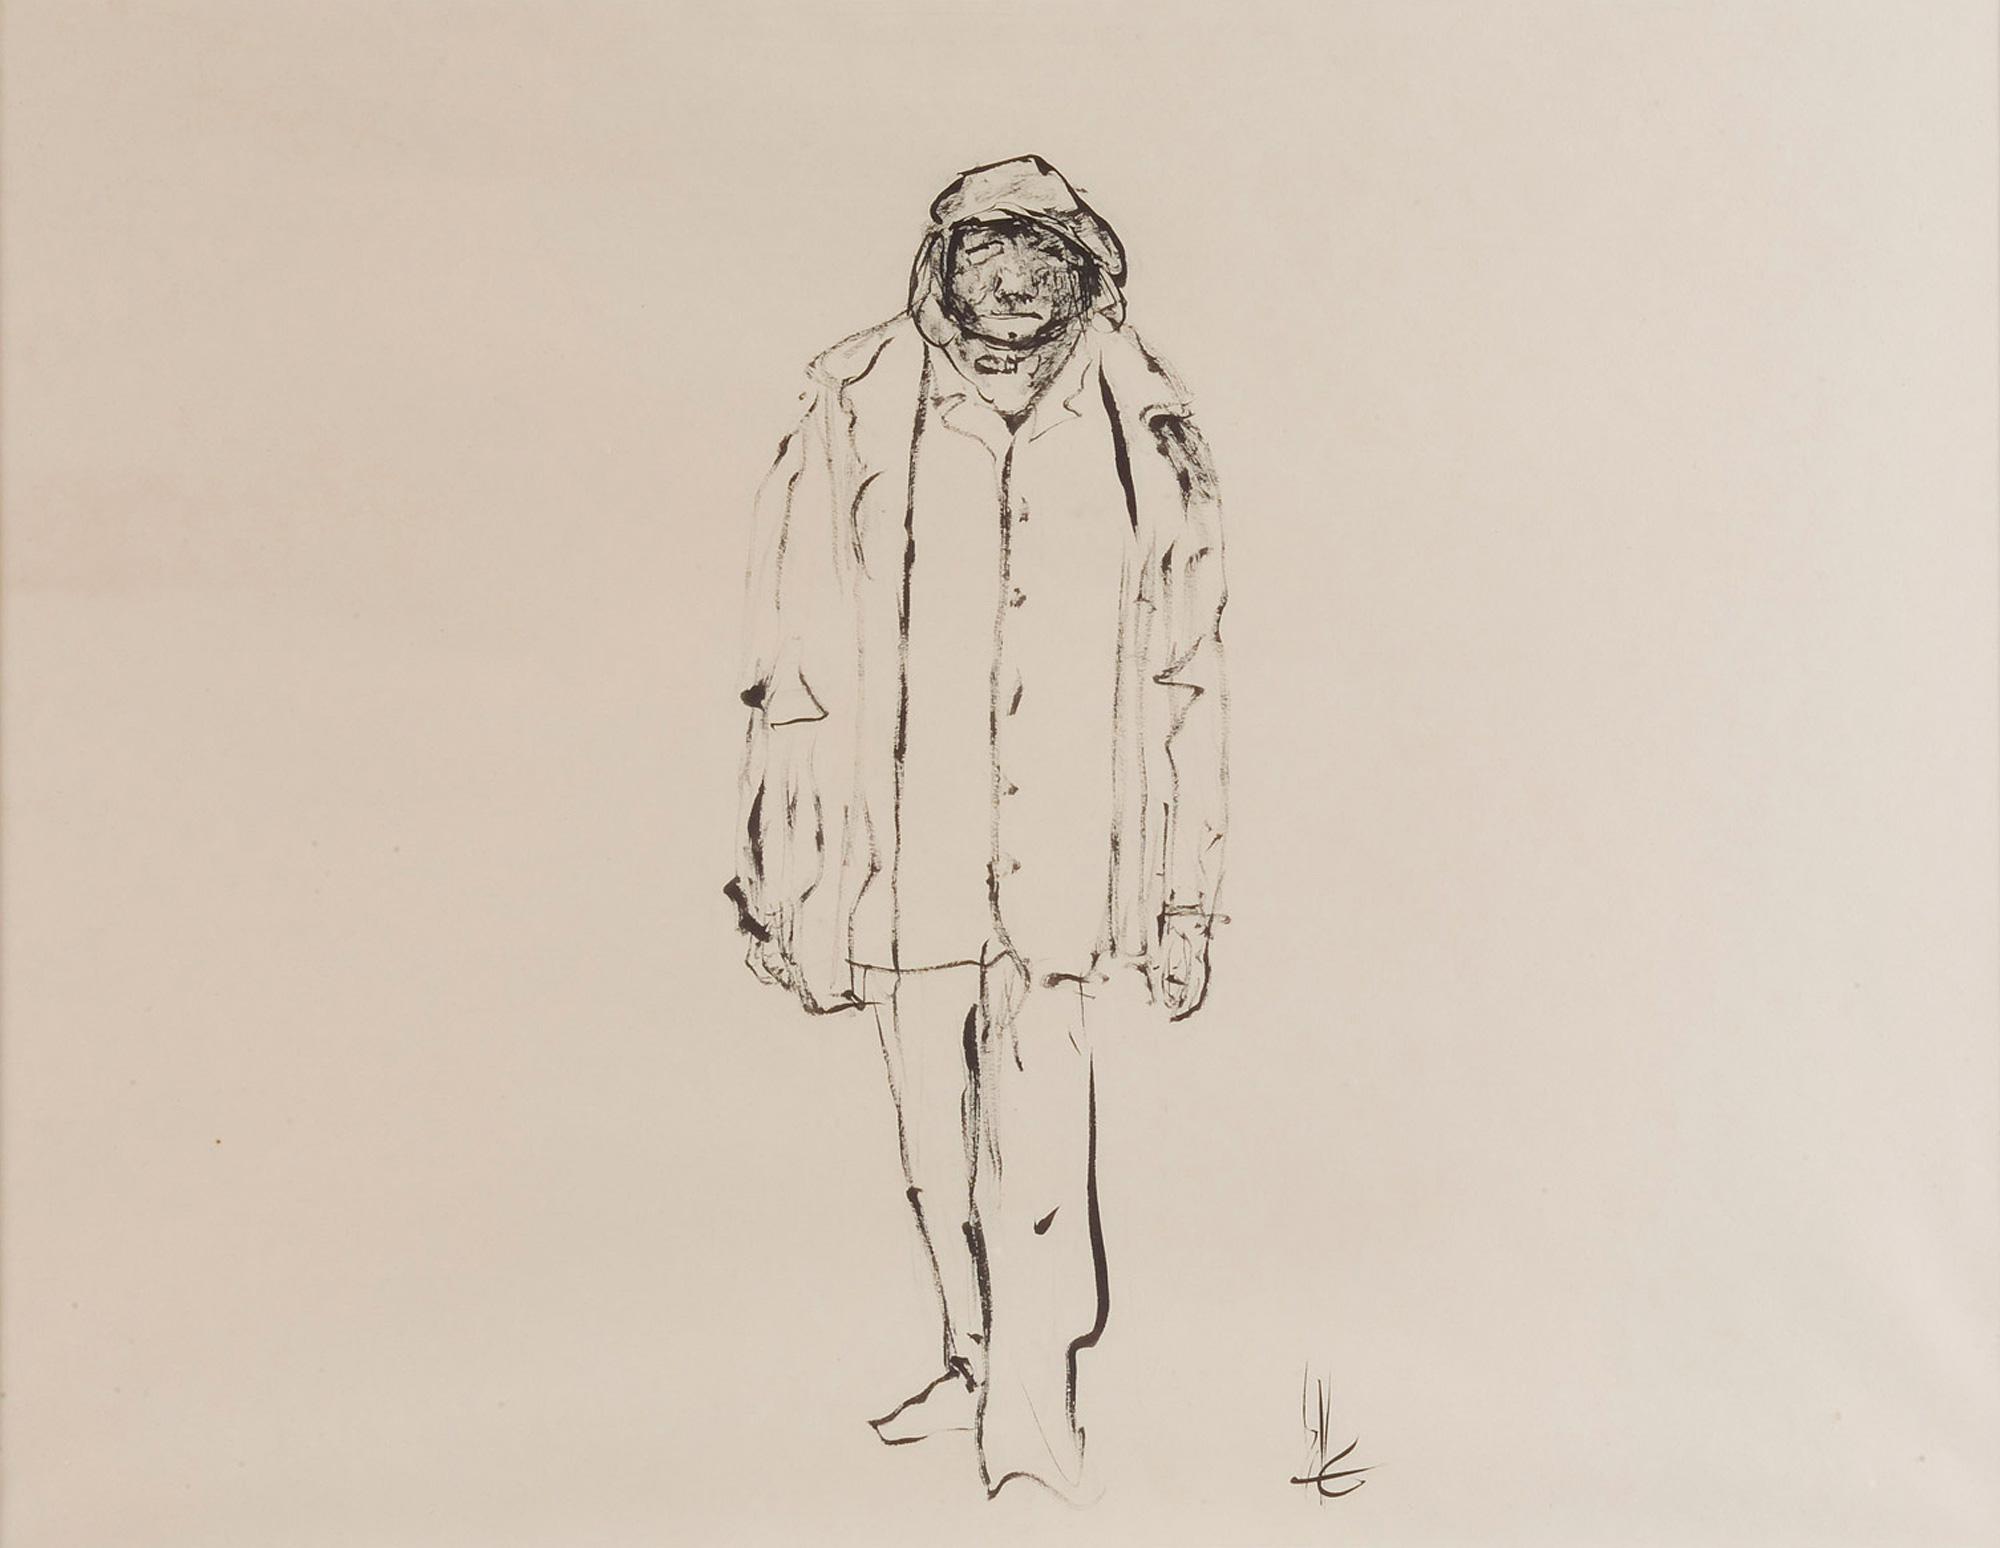 Melle schilder | zonder titel, oostindische inkt op papier